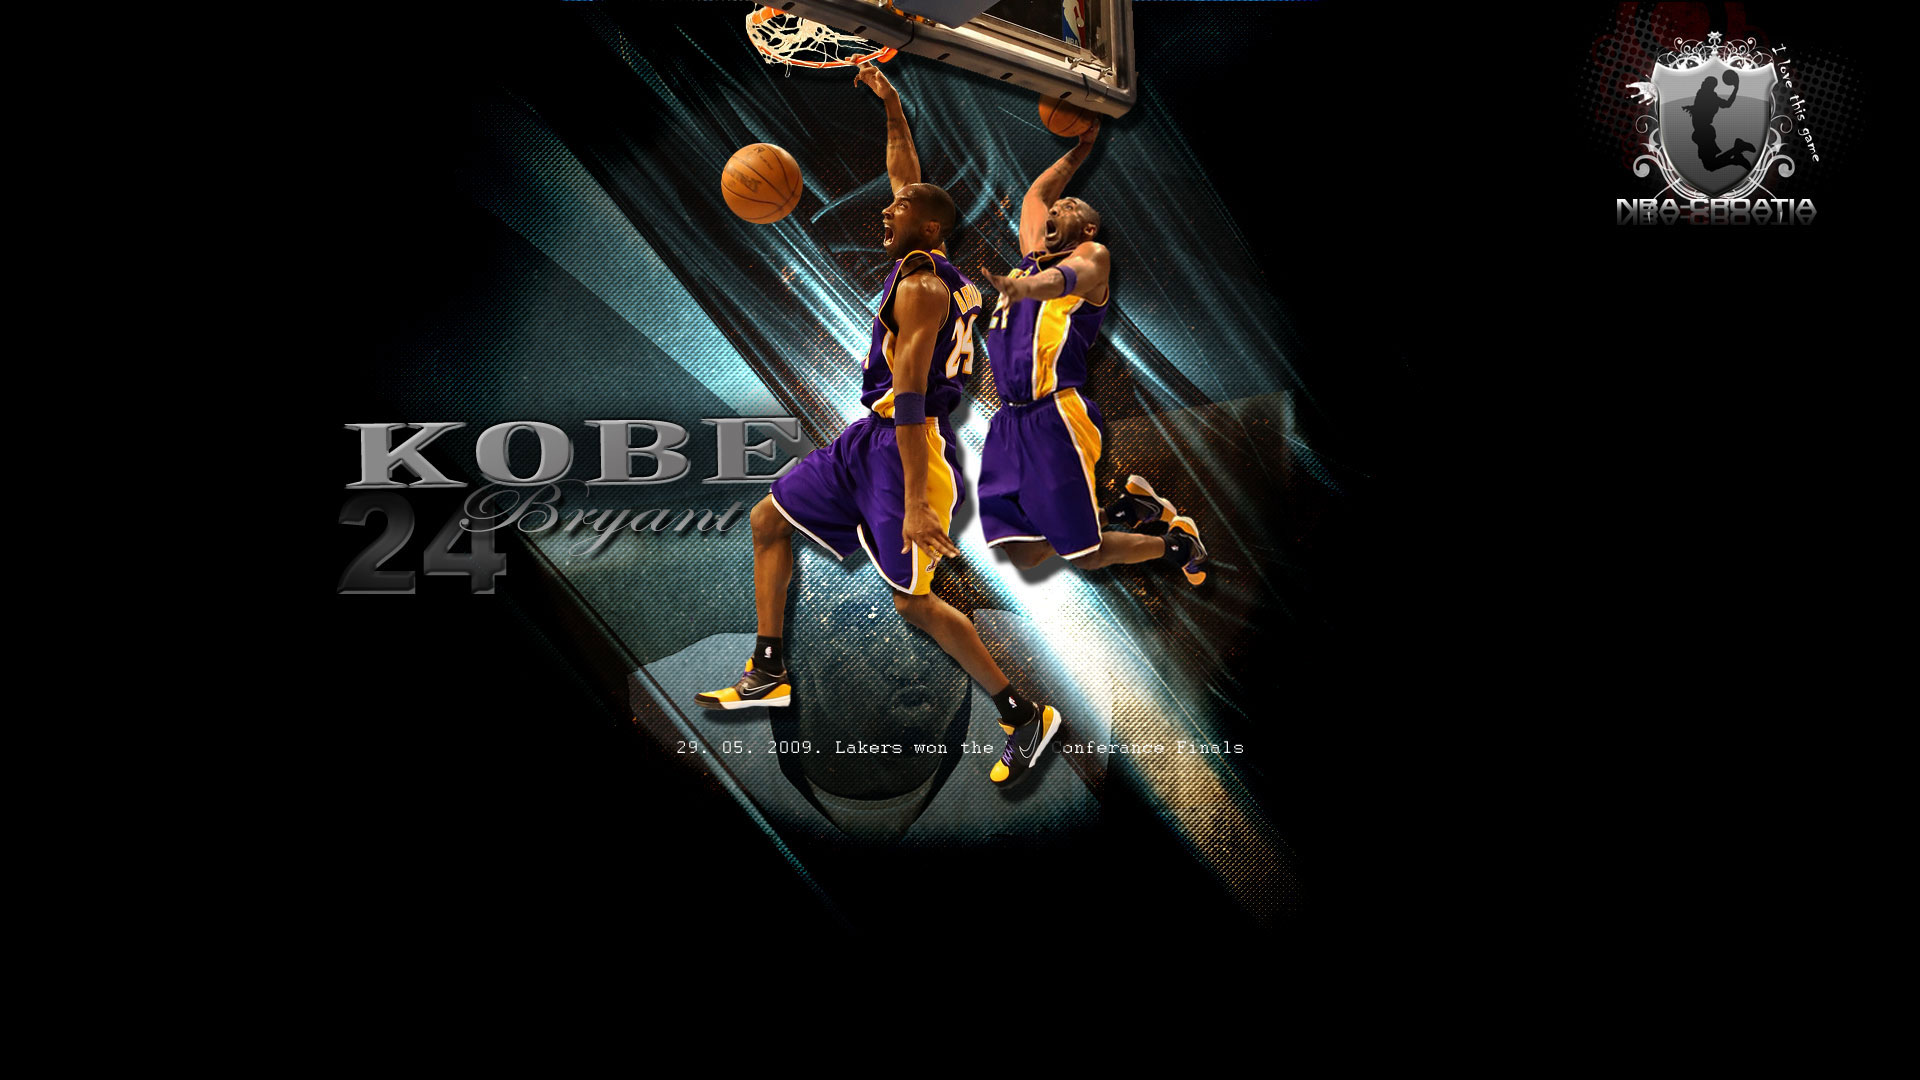 Lakers Kobe Bryant Wallpaper HD 1920x1080